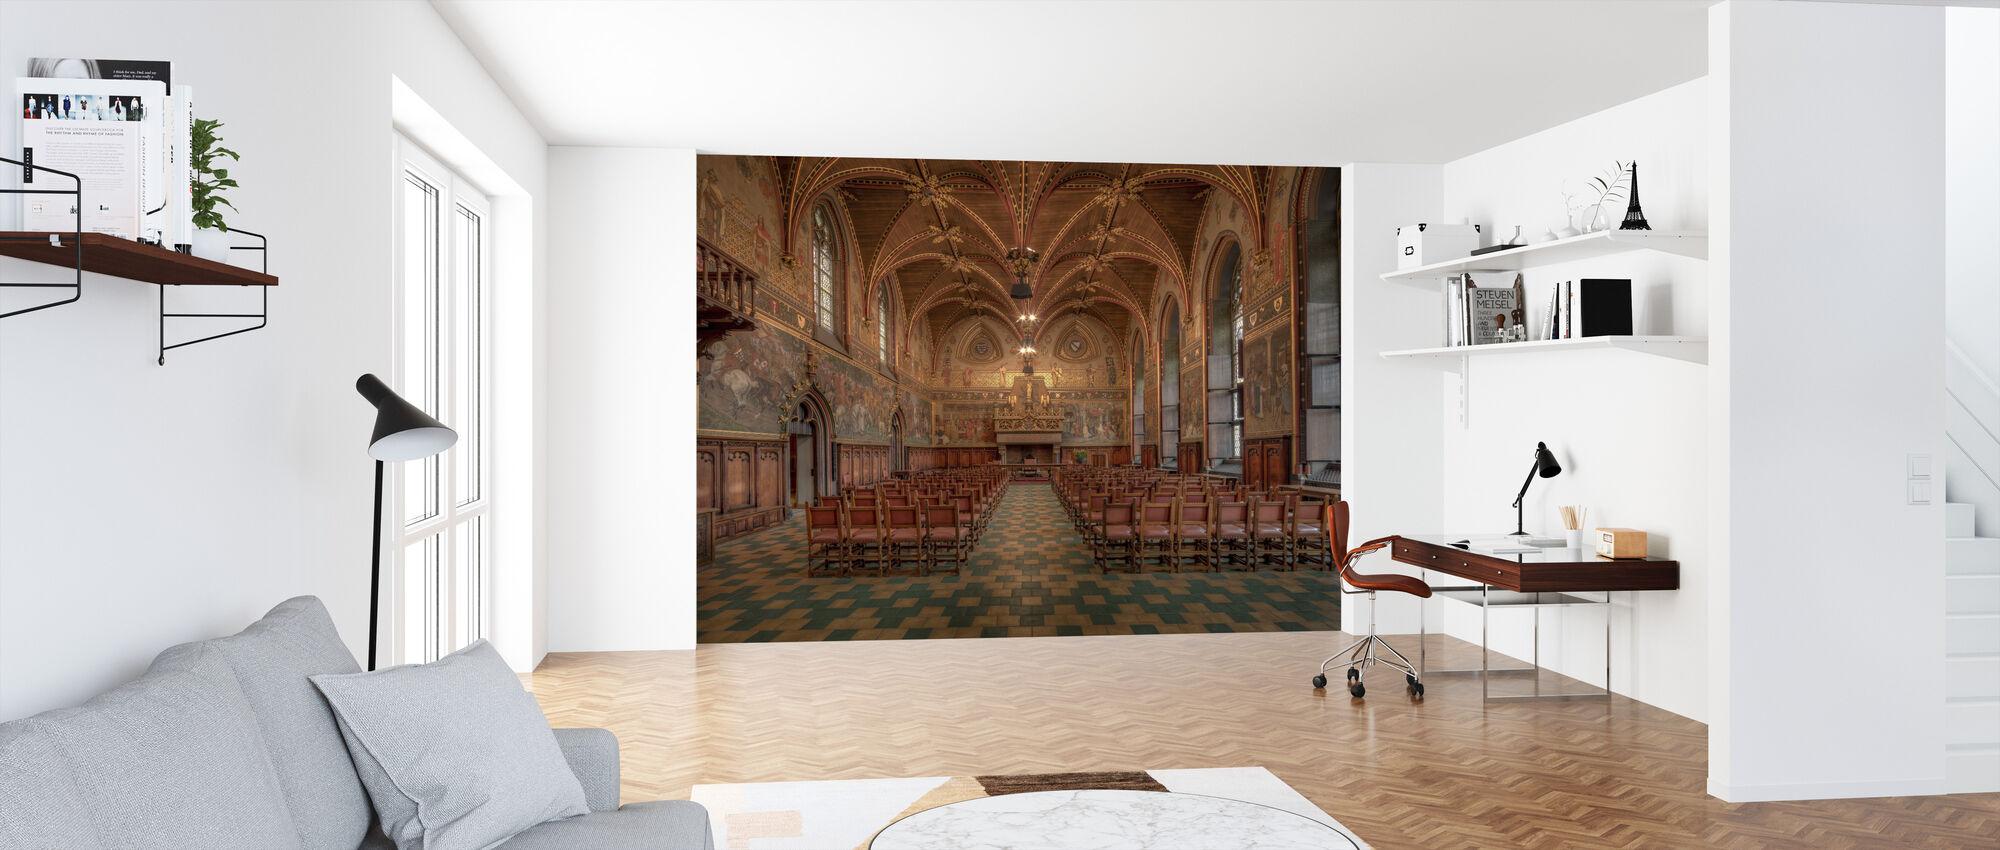 Bruges City Hall - Wallpaper - Office